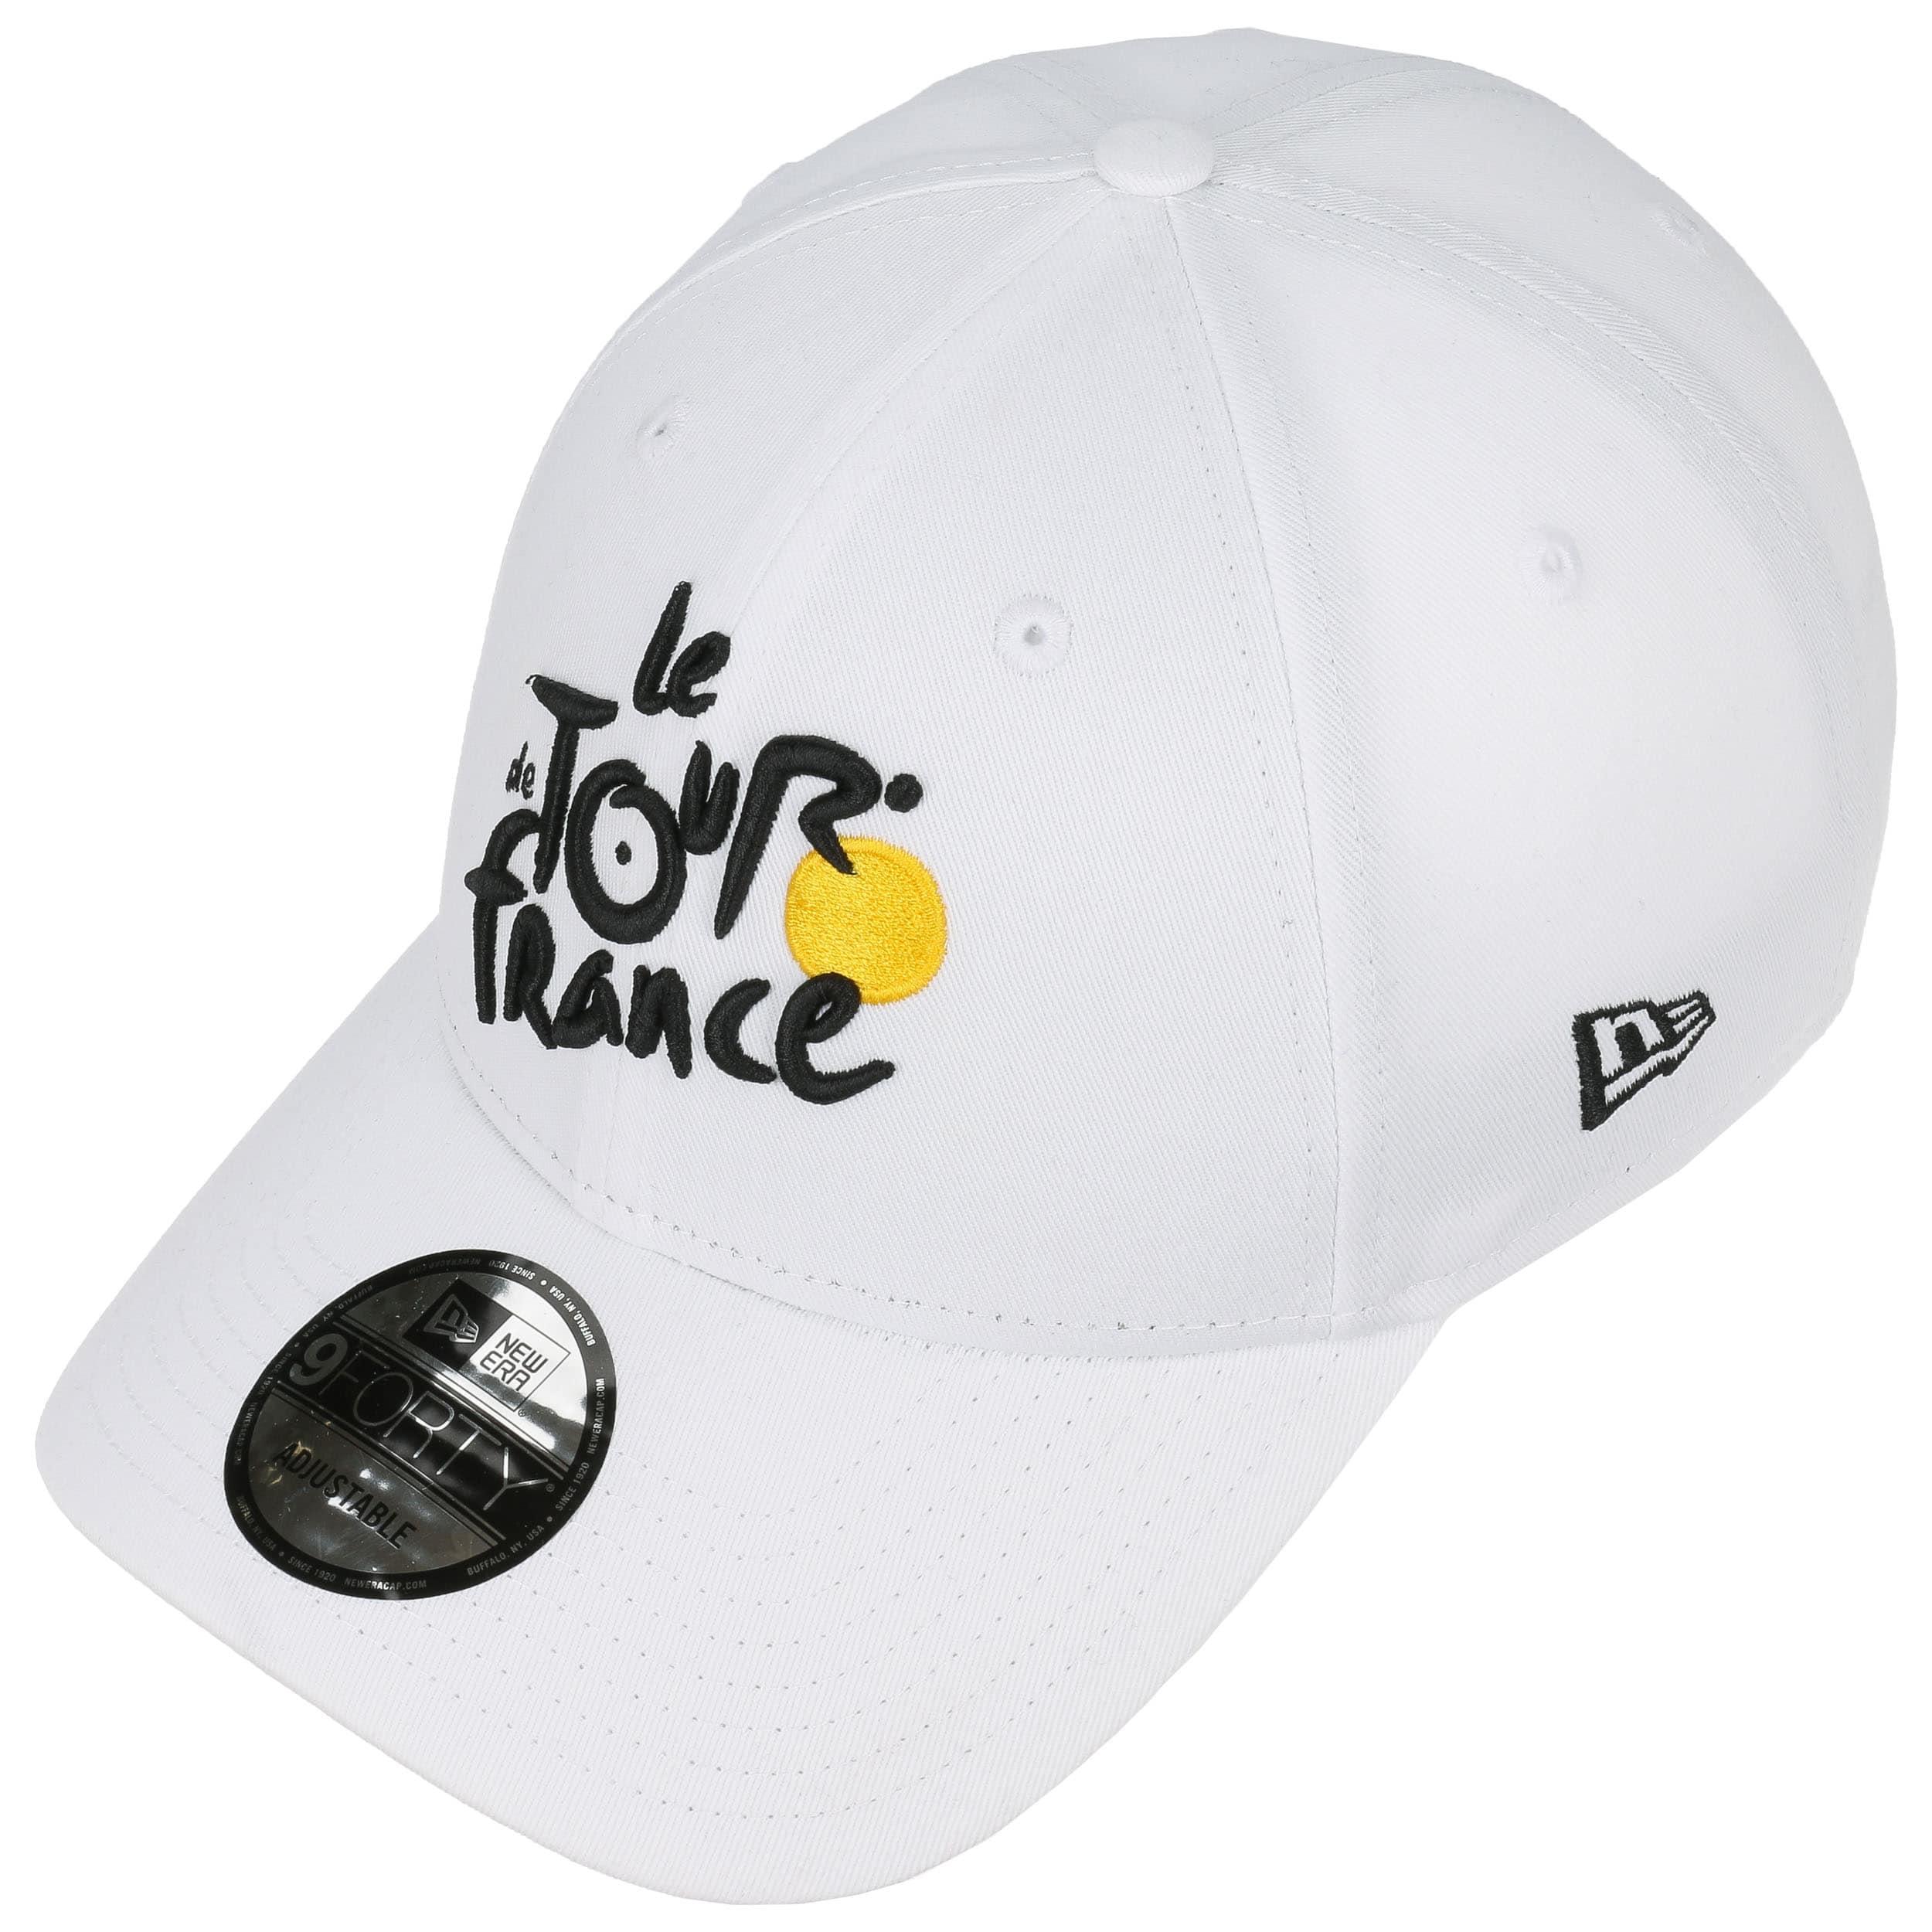 9Forty JP Tour de France Cap by New Era - white 1 ... ef14bc4a2ae3